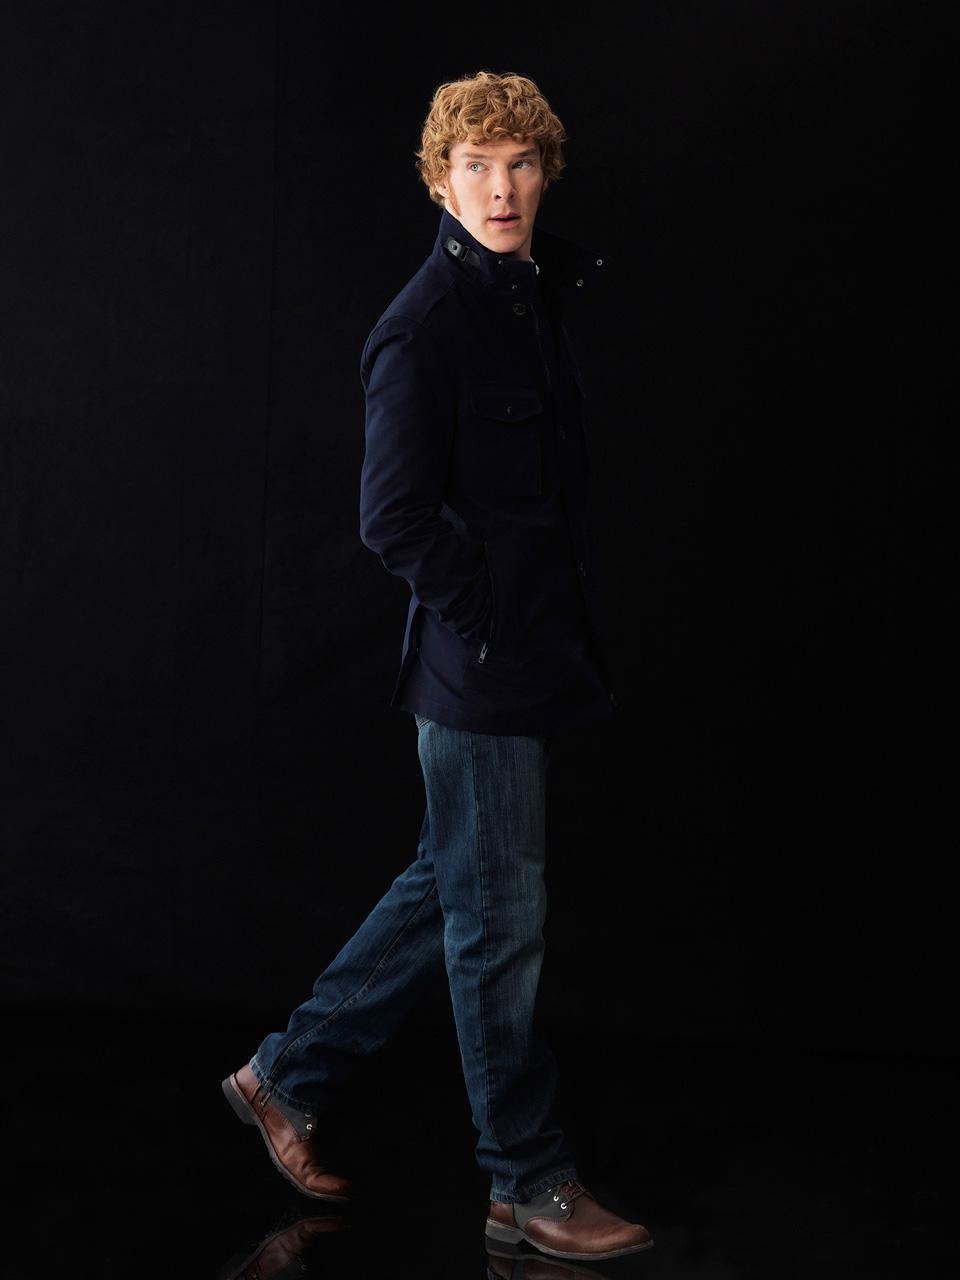 Benedict Cumberbatch 'War Horse' Photoshoot - Benedict ...